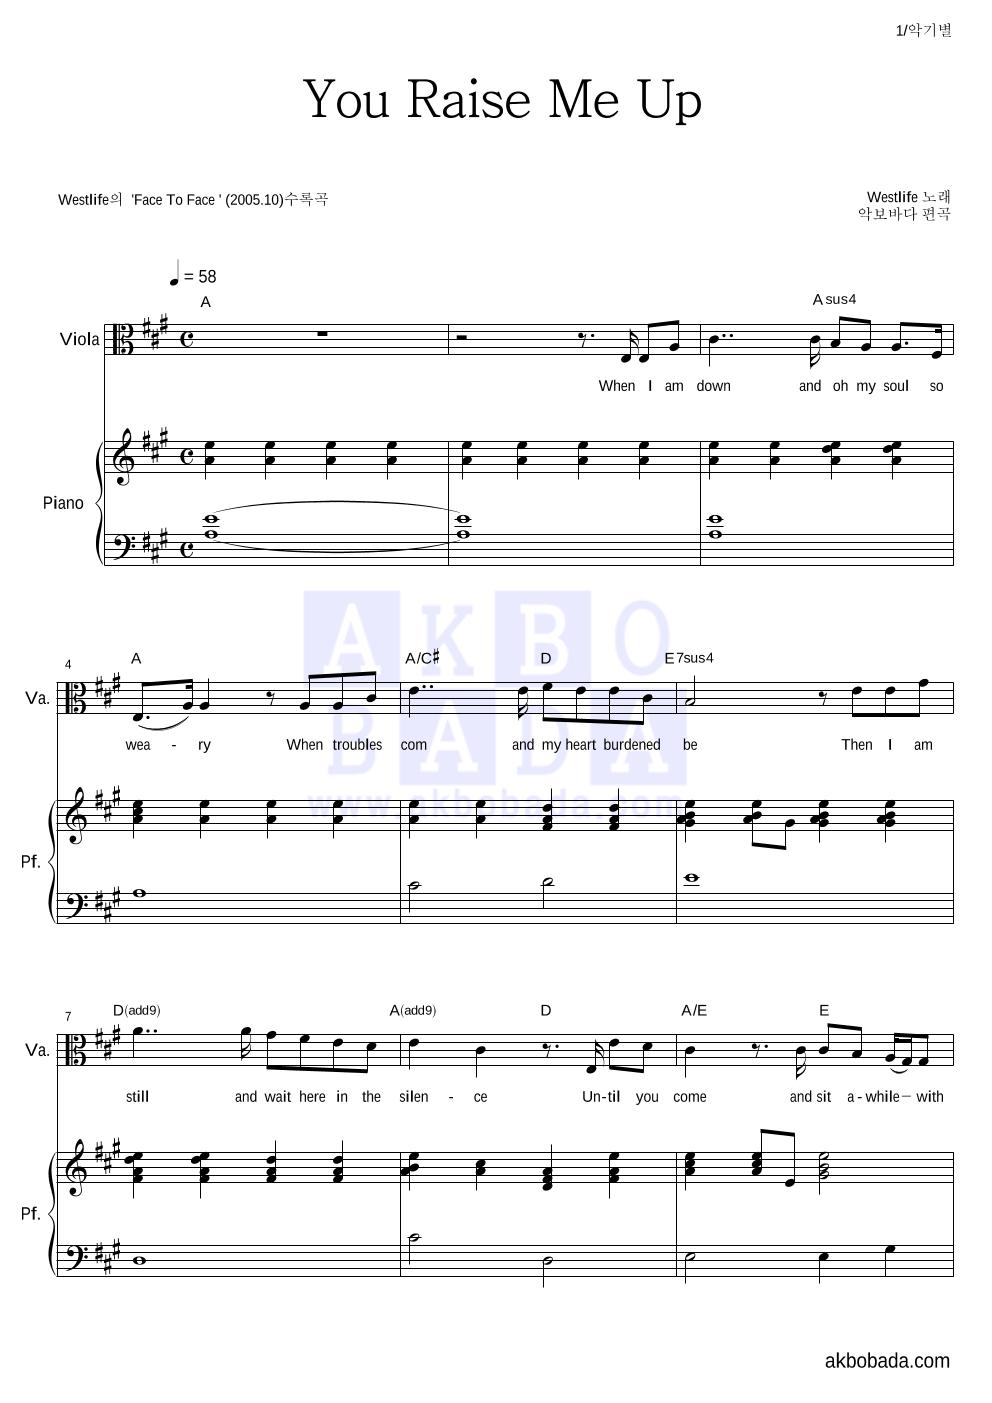 Westlife - You Raise Me Up 비올라&피아노 악보